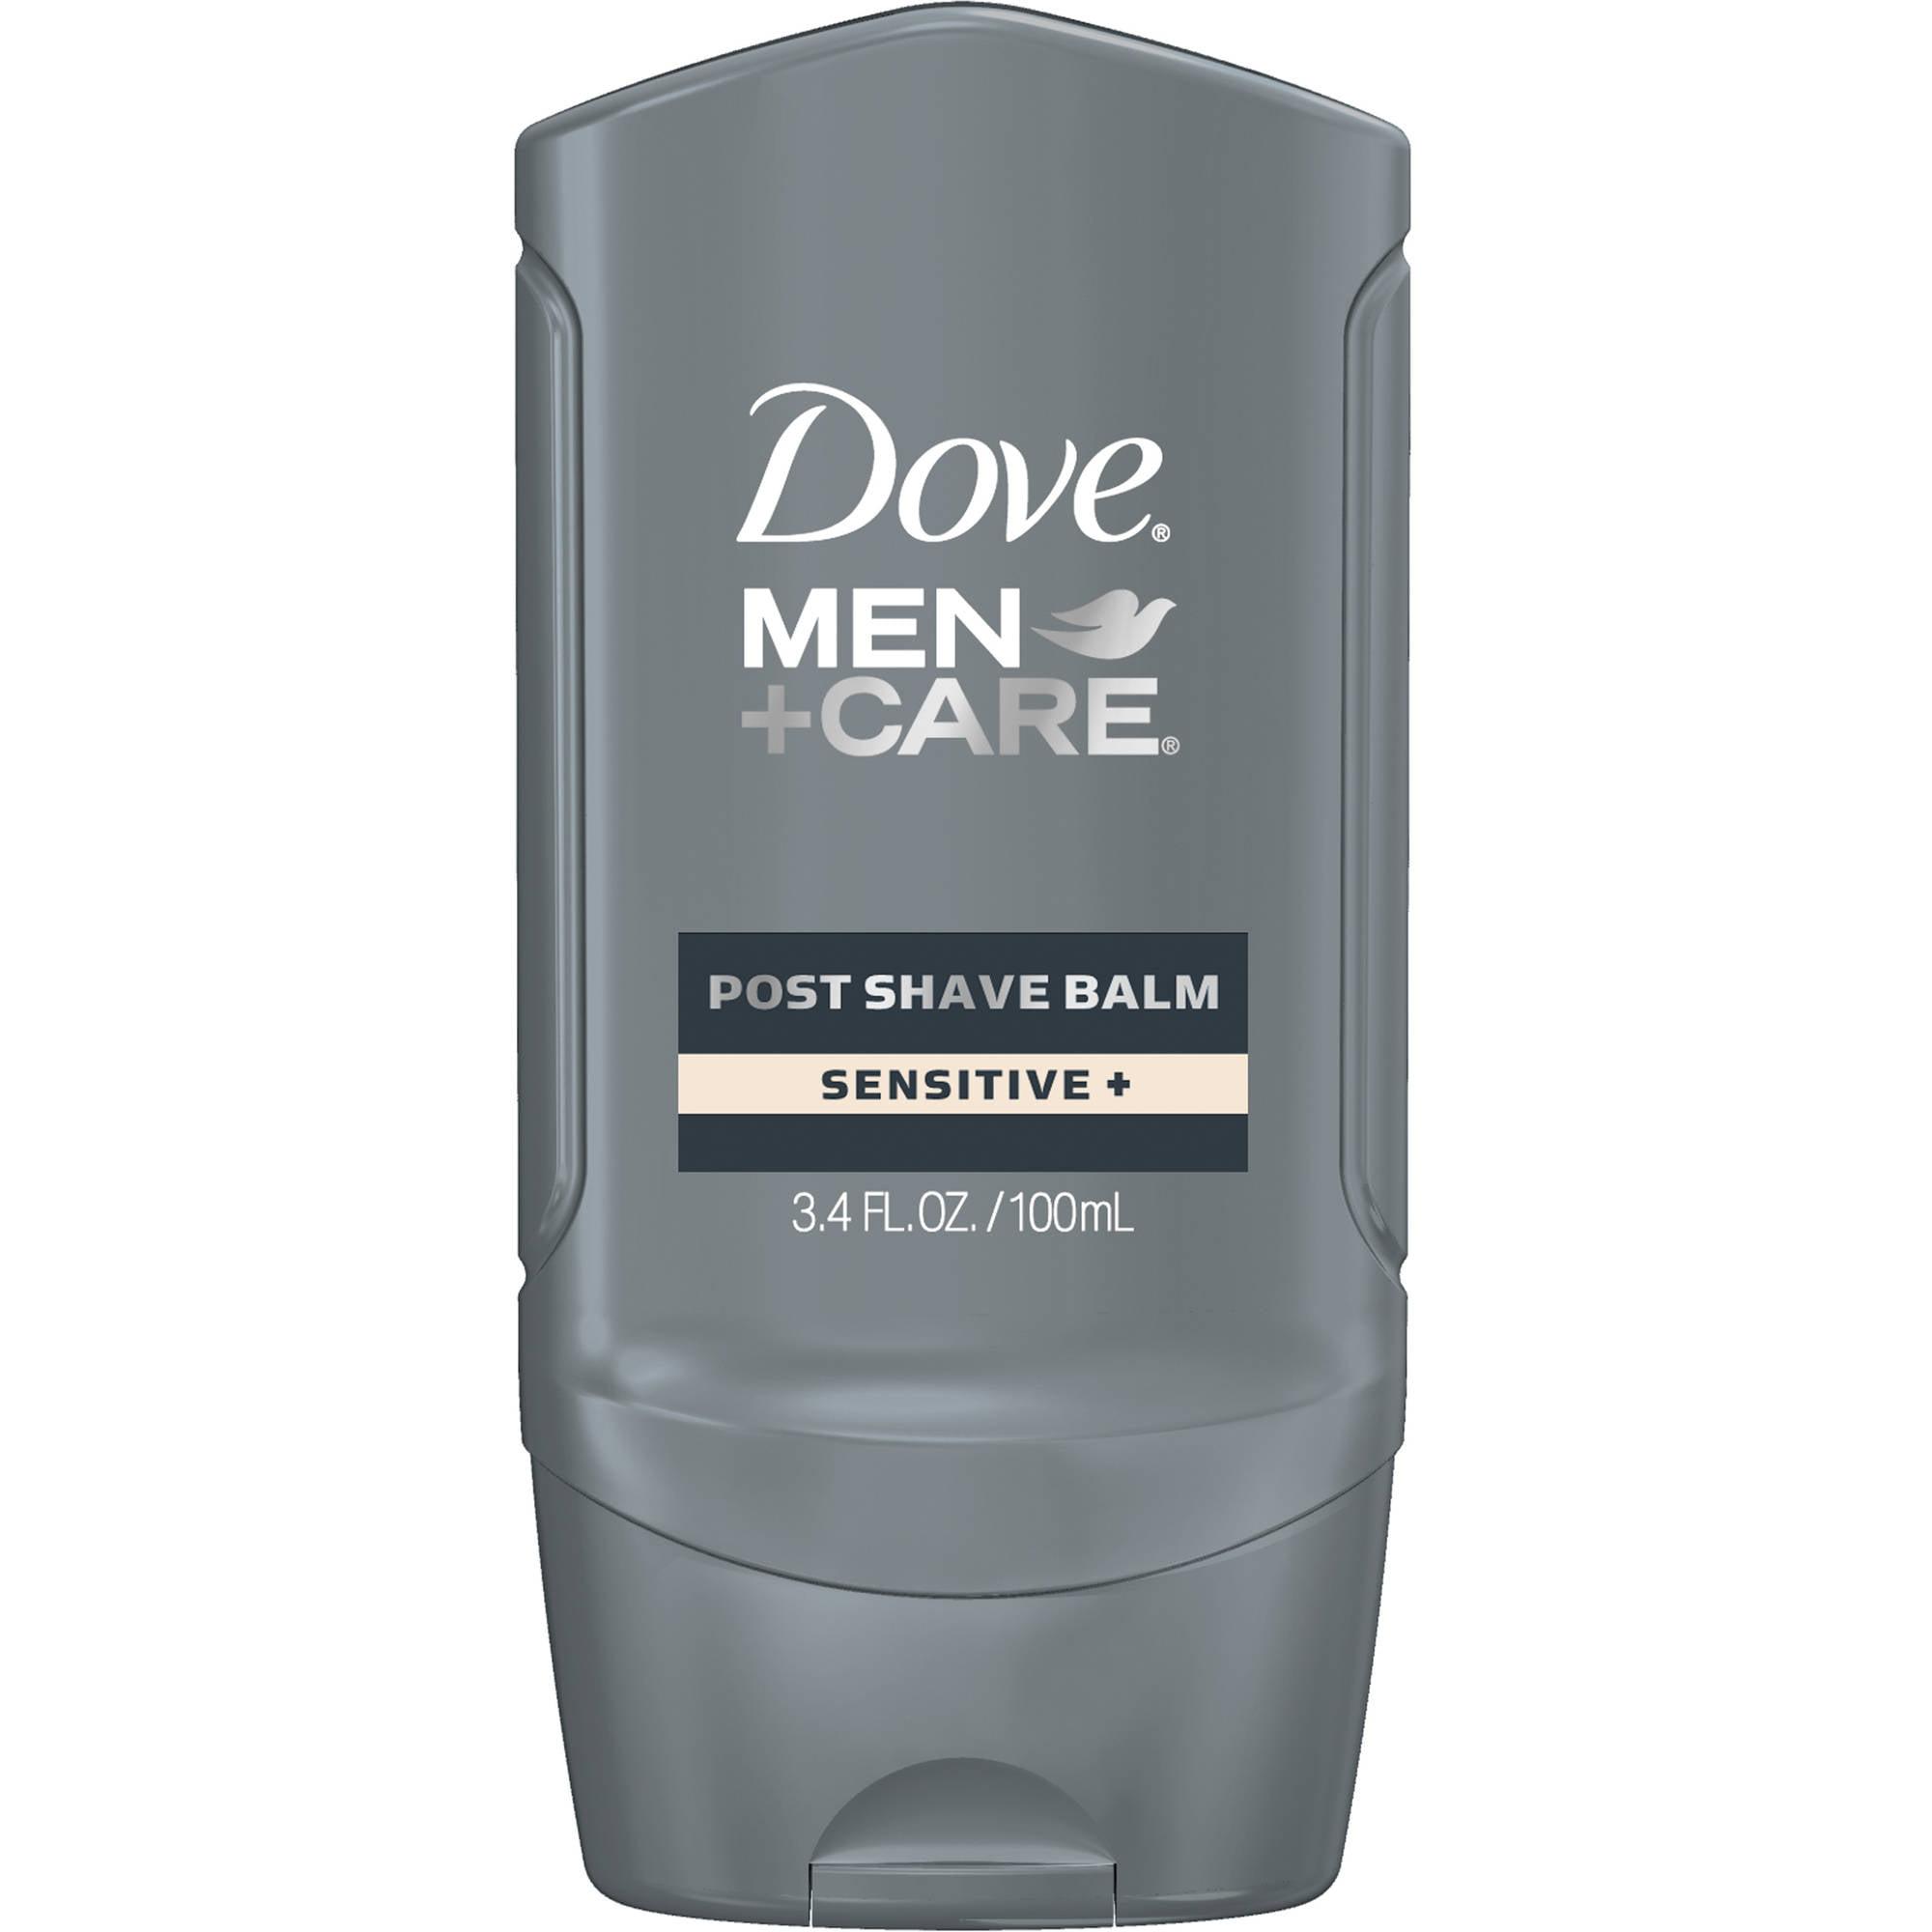 Dove Men + Care Post Shave Balm, Sensitive 3.4 oz